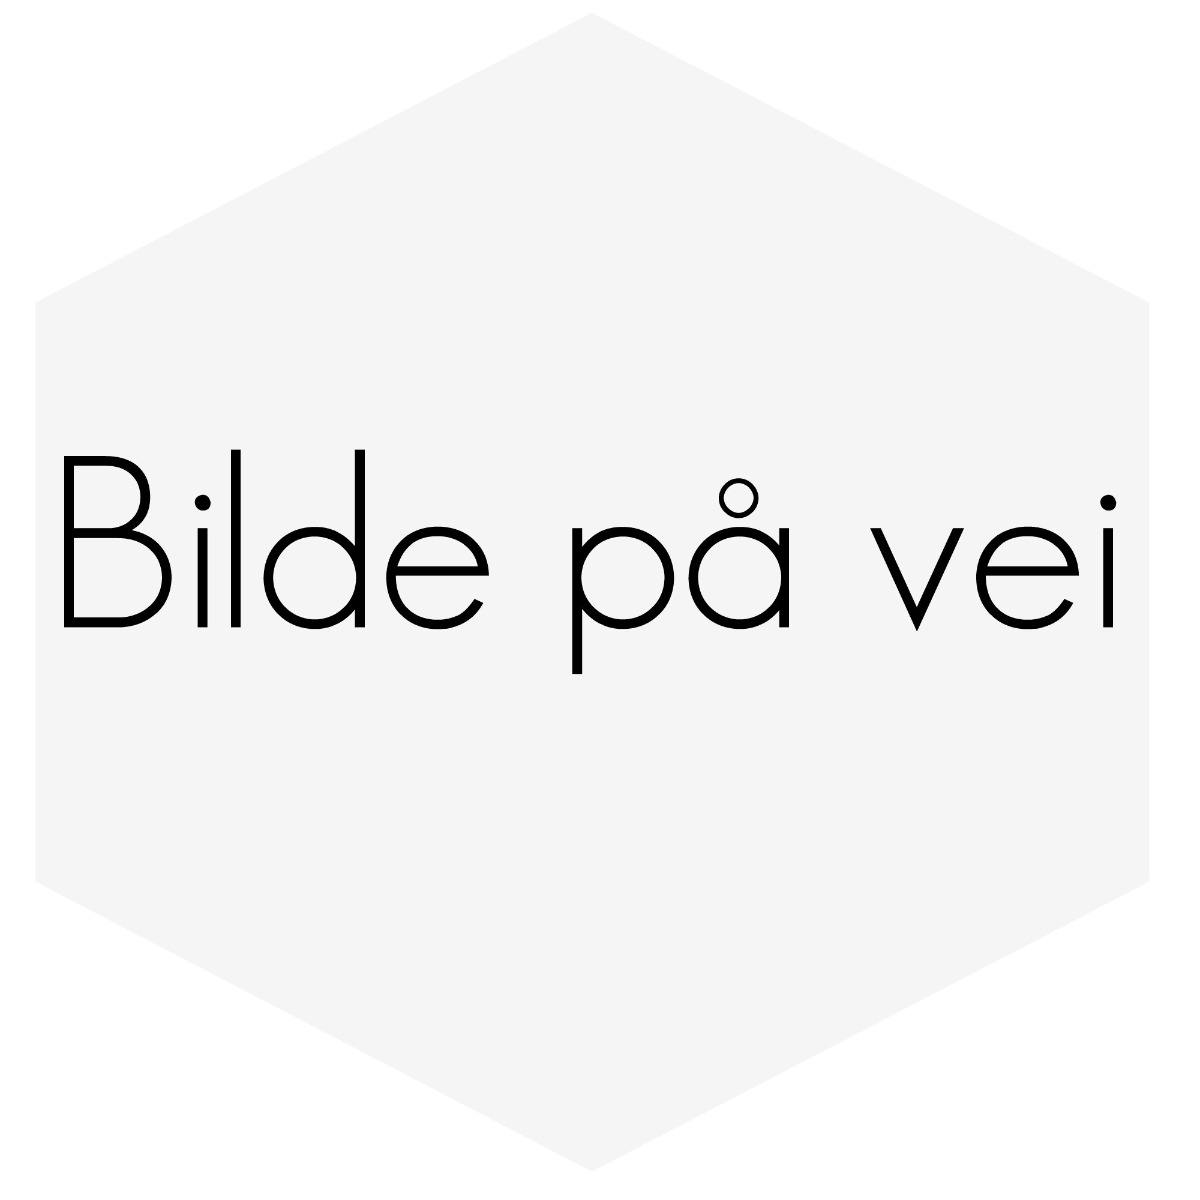 HOVEDLAMPE VOLVO S/V40-03 /04 SOT VENSTRE SIDE 30899878